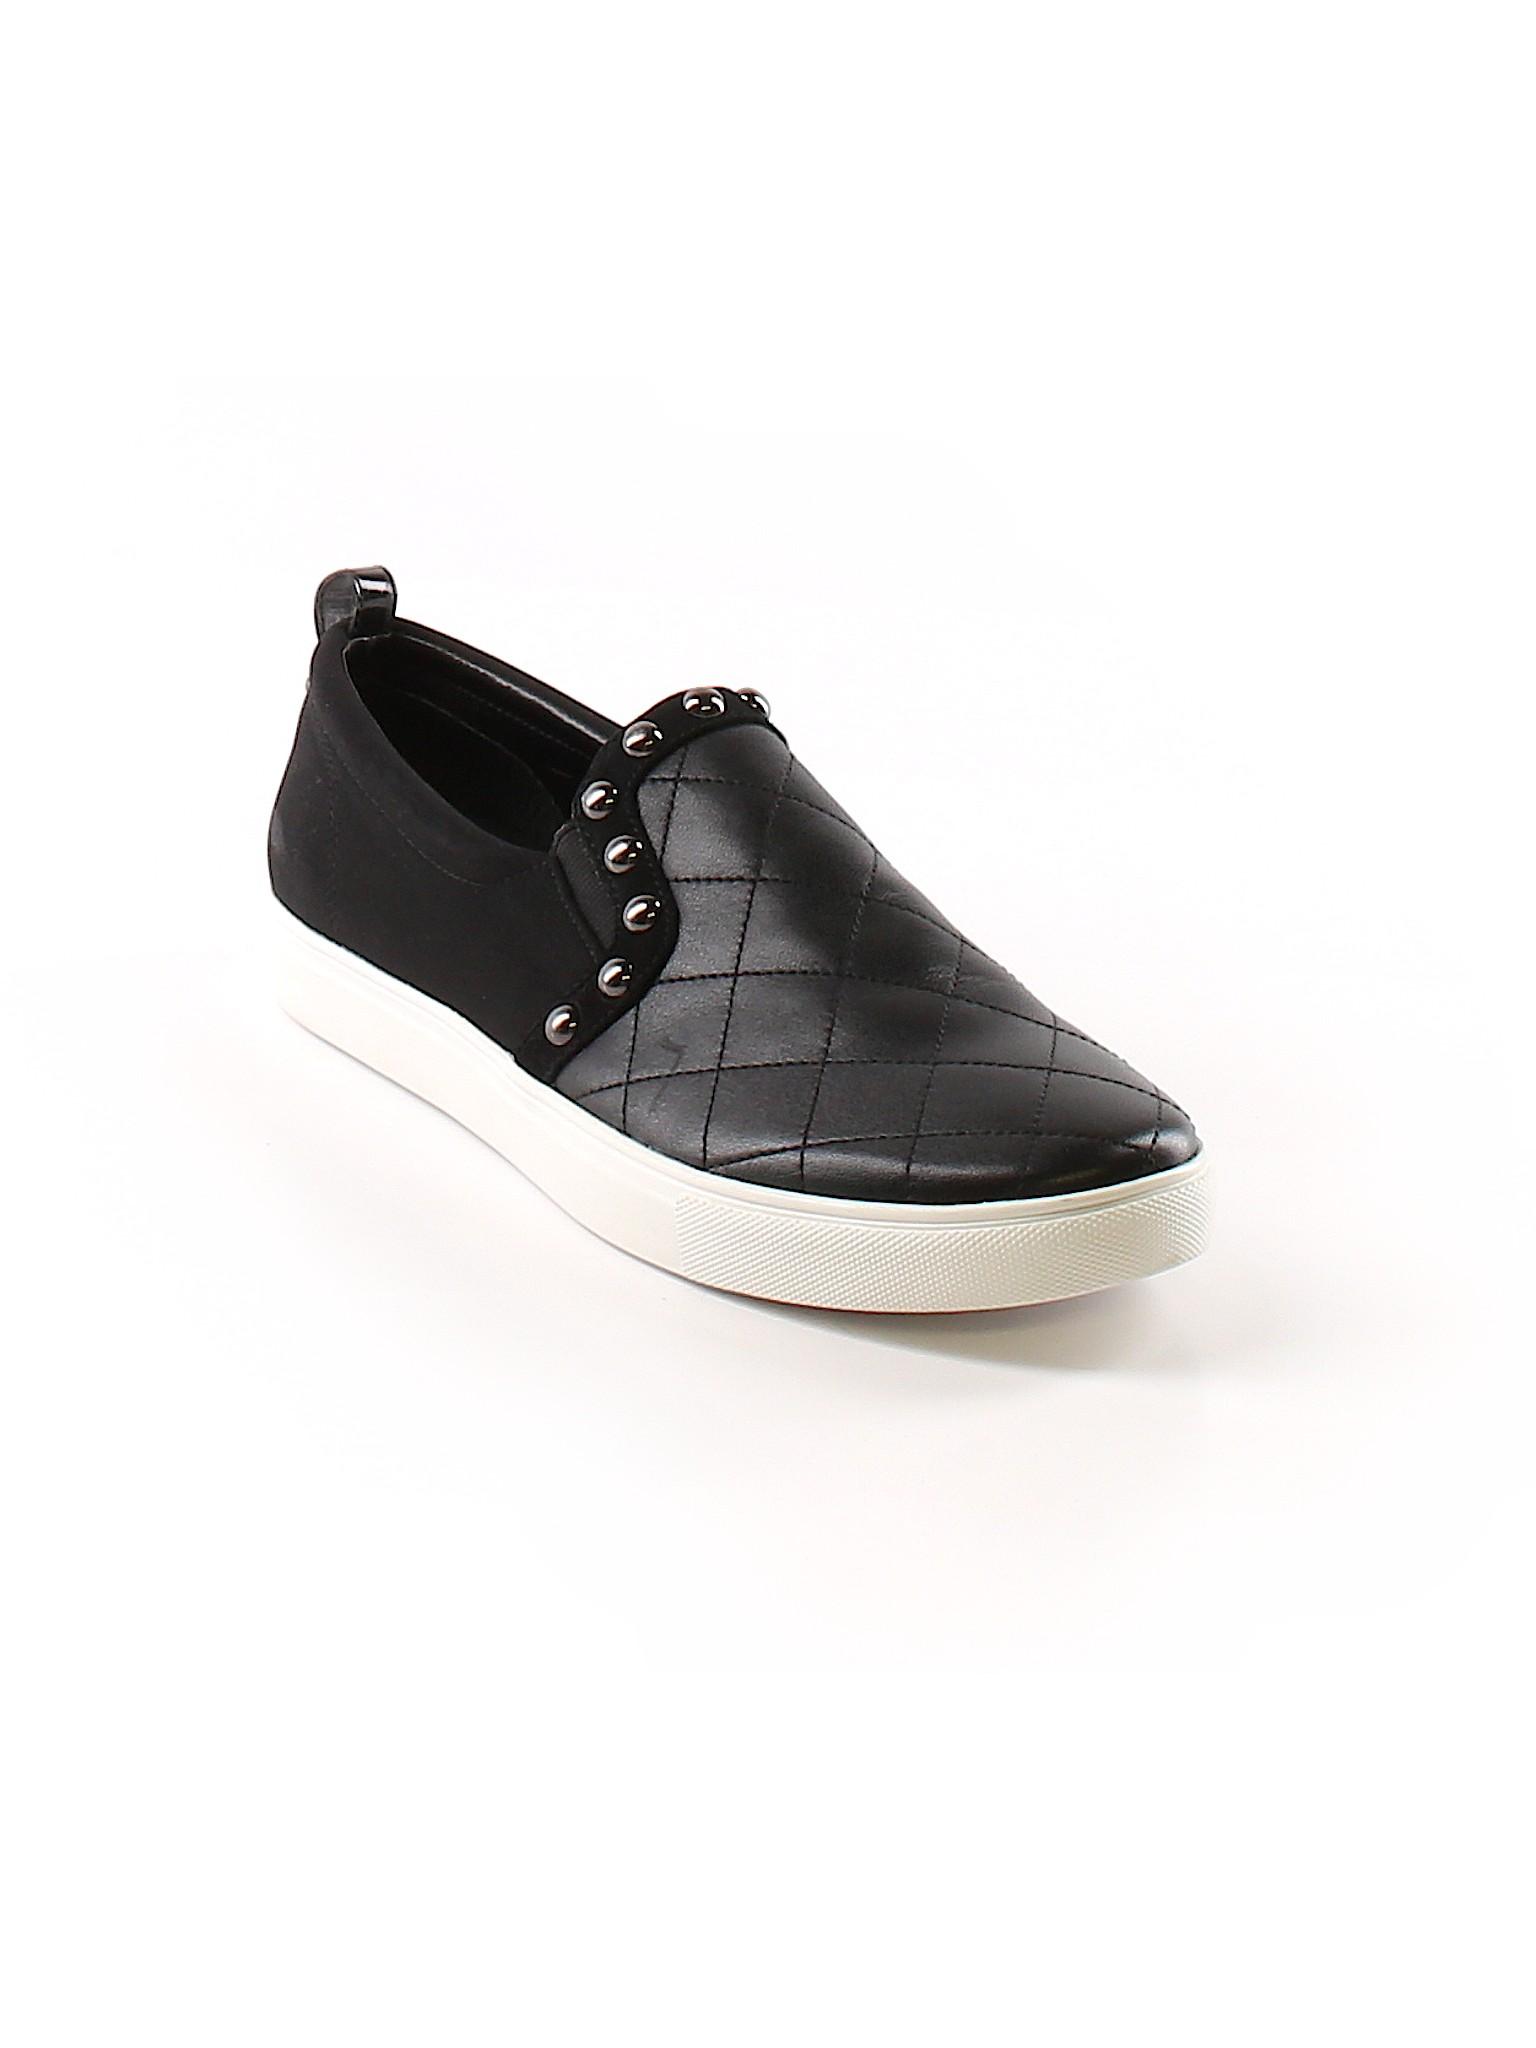 promotion J Boutique Pliner Sneakers Donald 7nFgUqwd